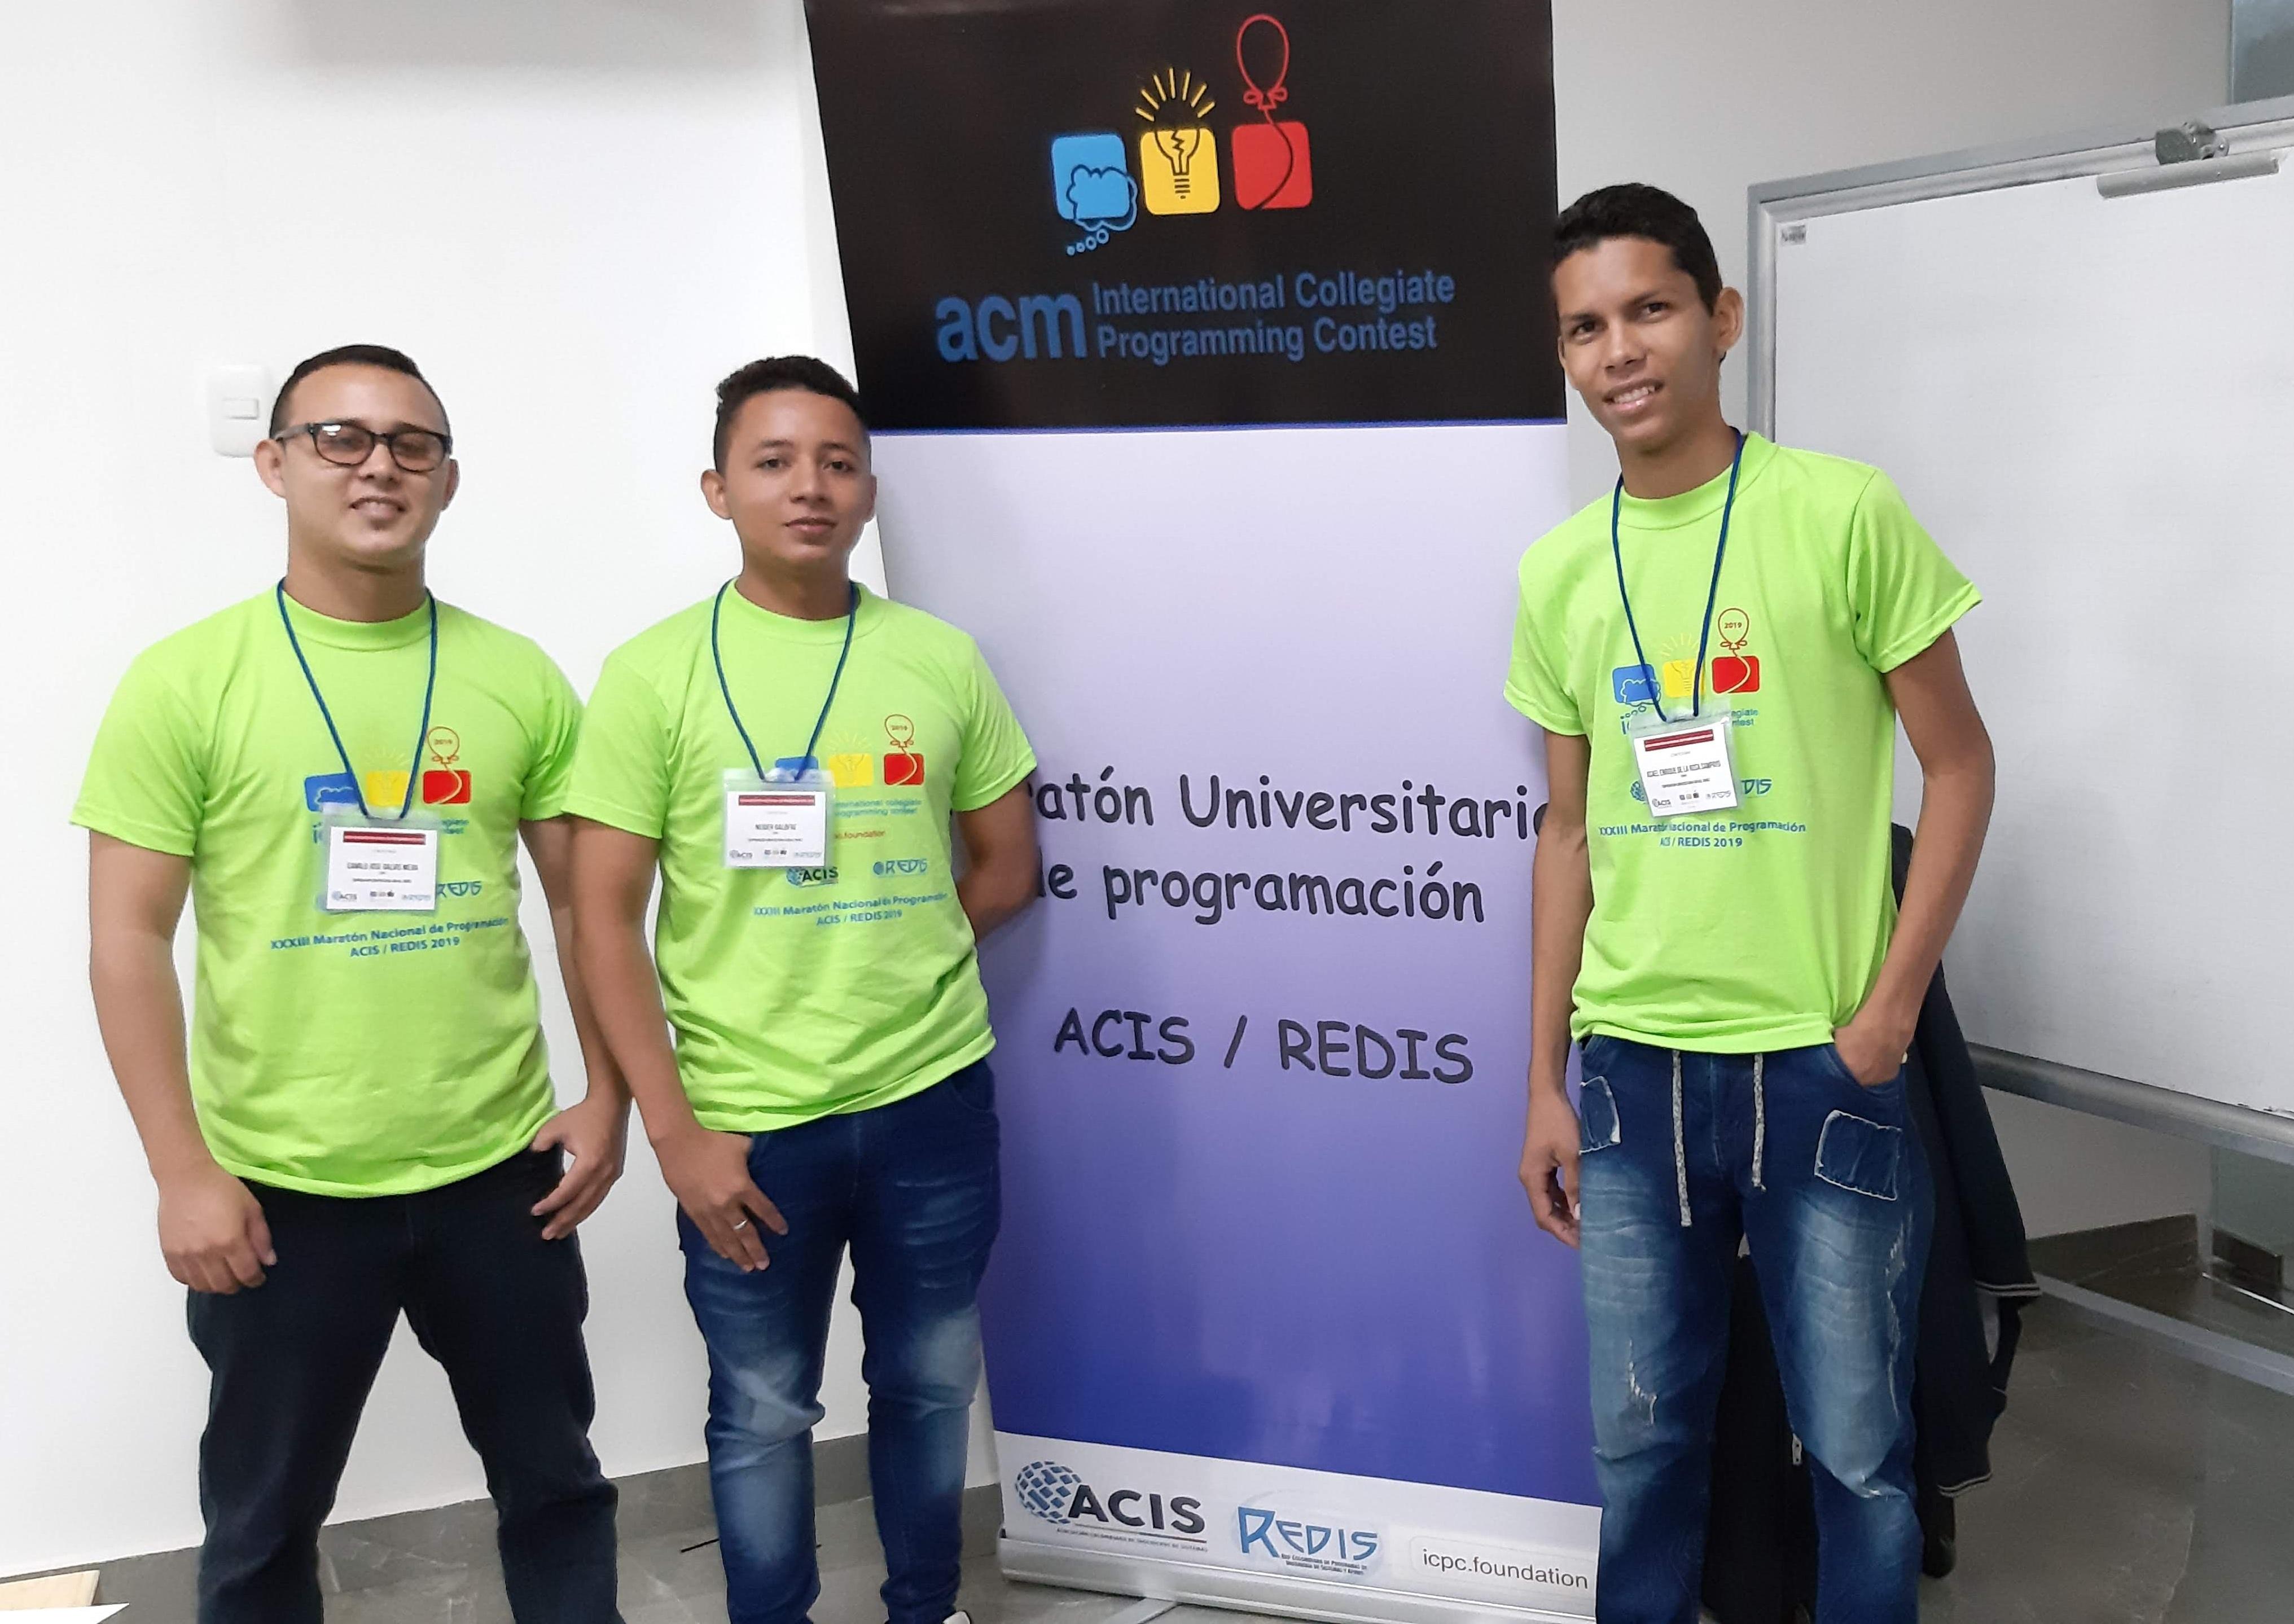 Estudiantes de Ingeniería participaron en XXXIII Maratón Nacional de Programación ACIS/REDIS